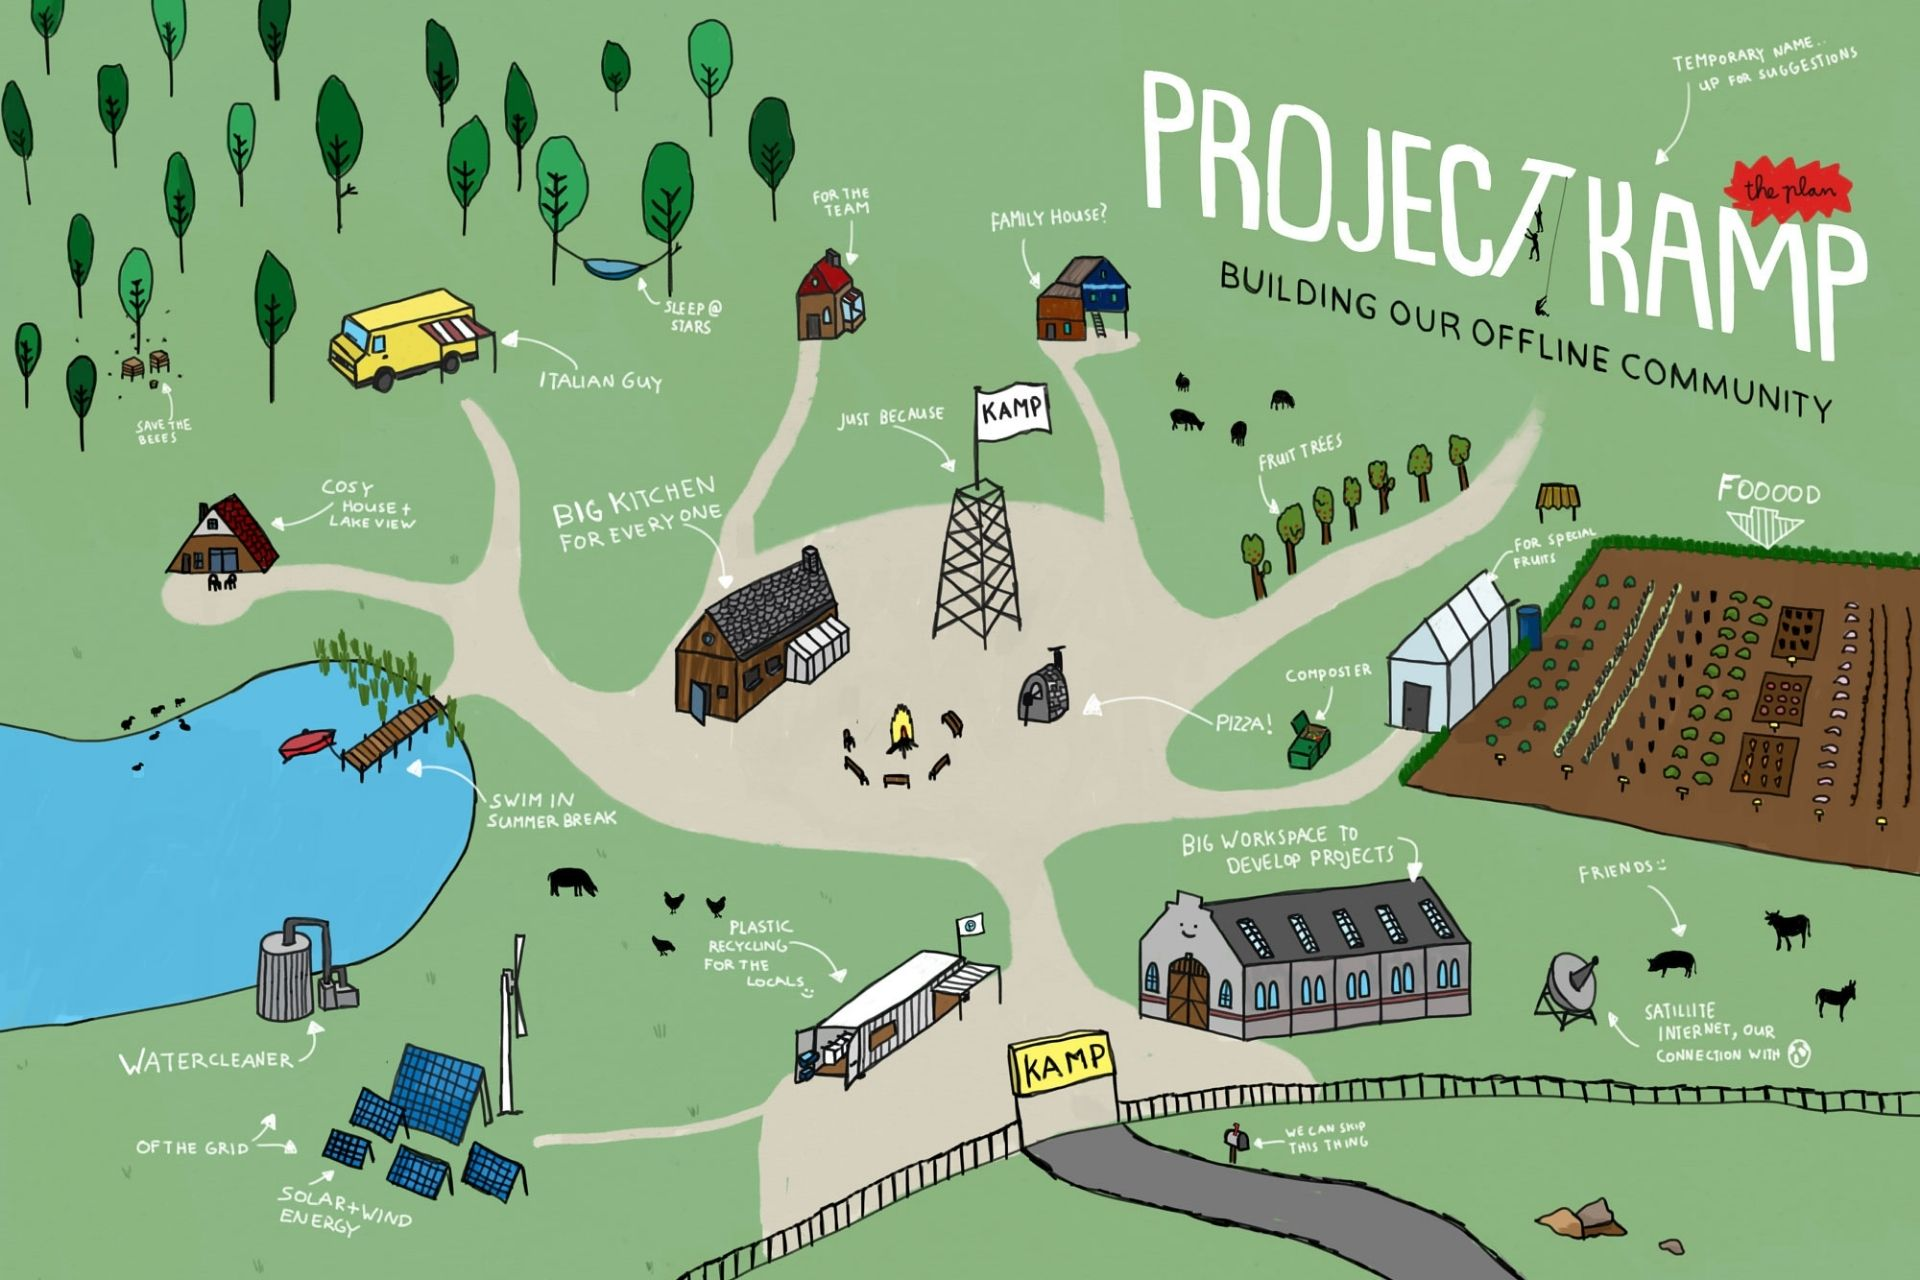 Project Kamp vision illustration